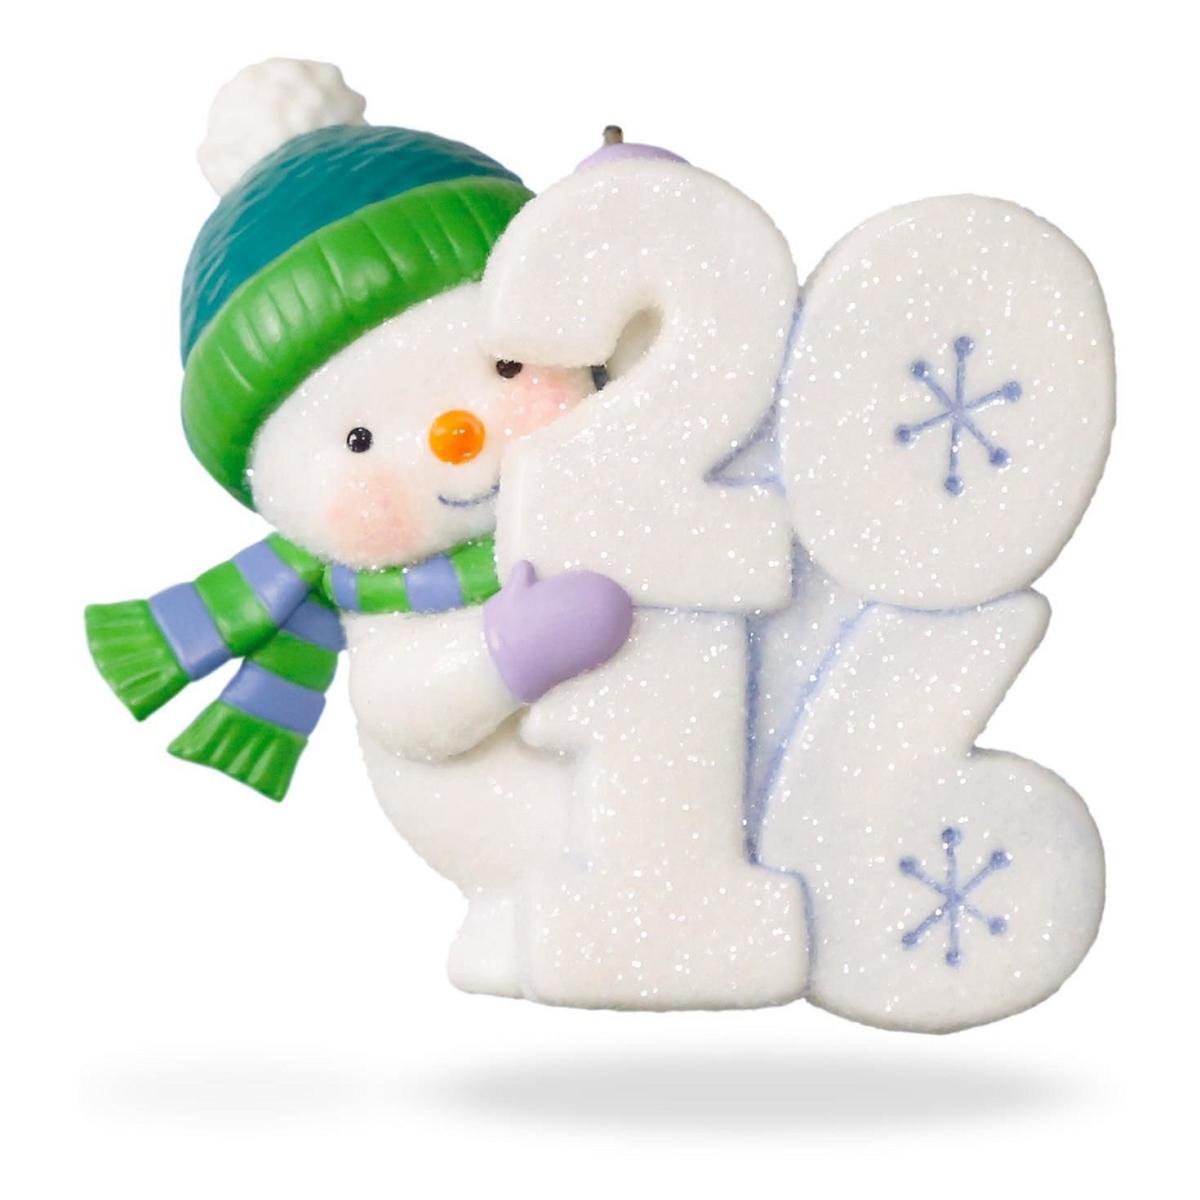 2016 Frosty Fun Decade Hallmark Keepsake Ornament - Hooked ...